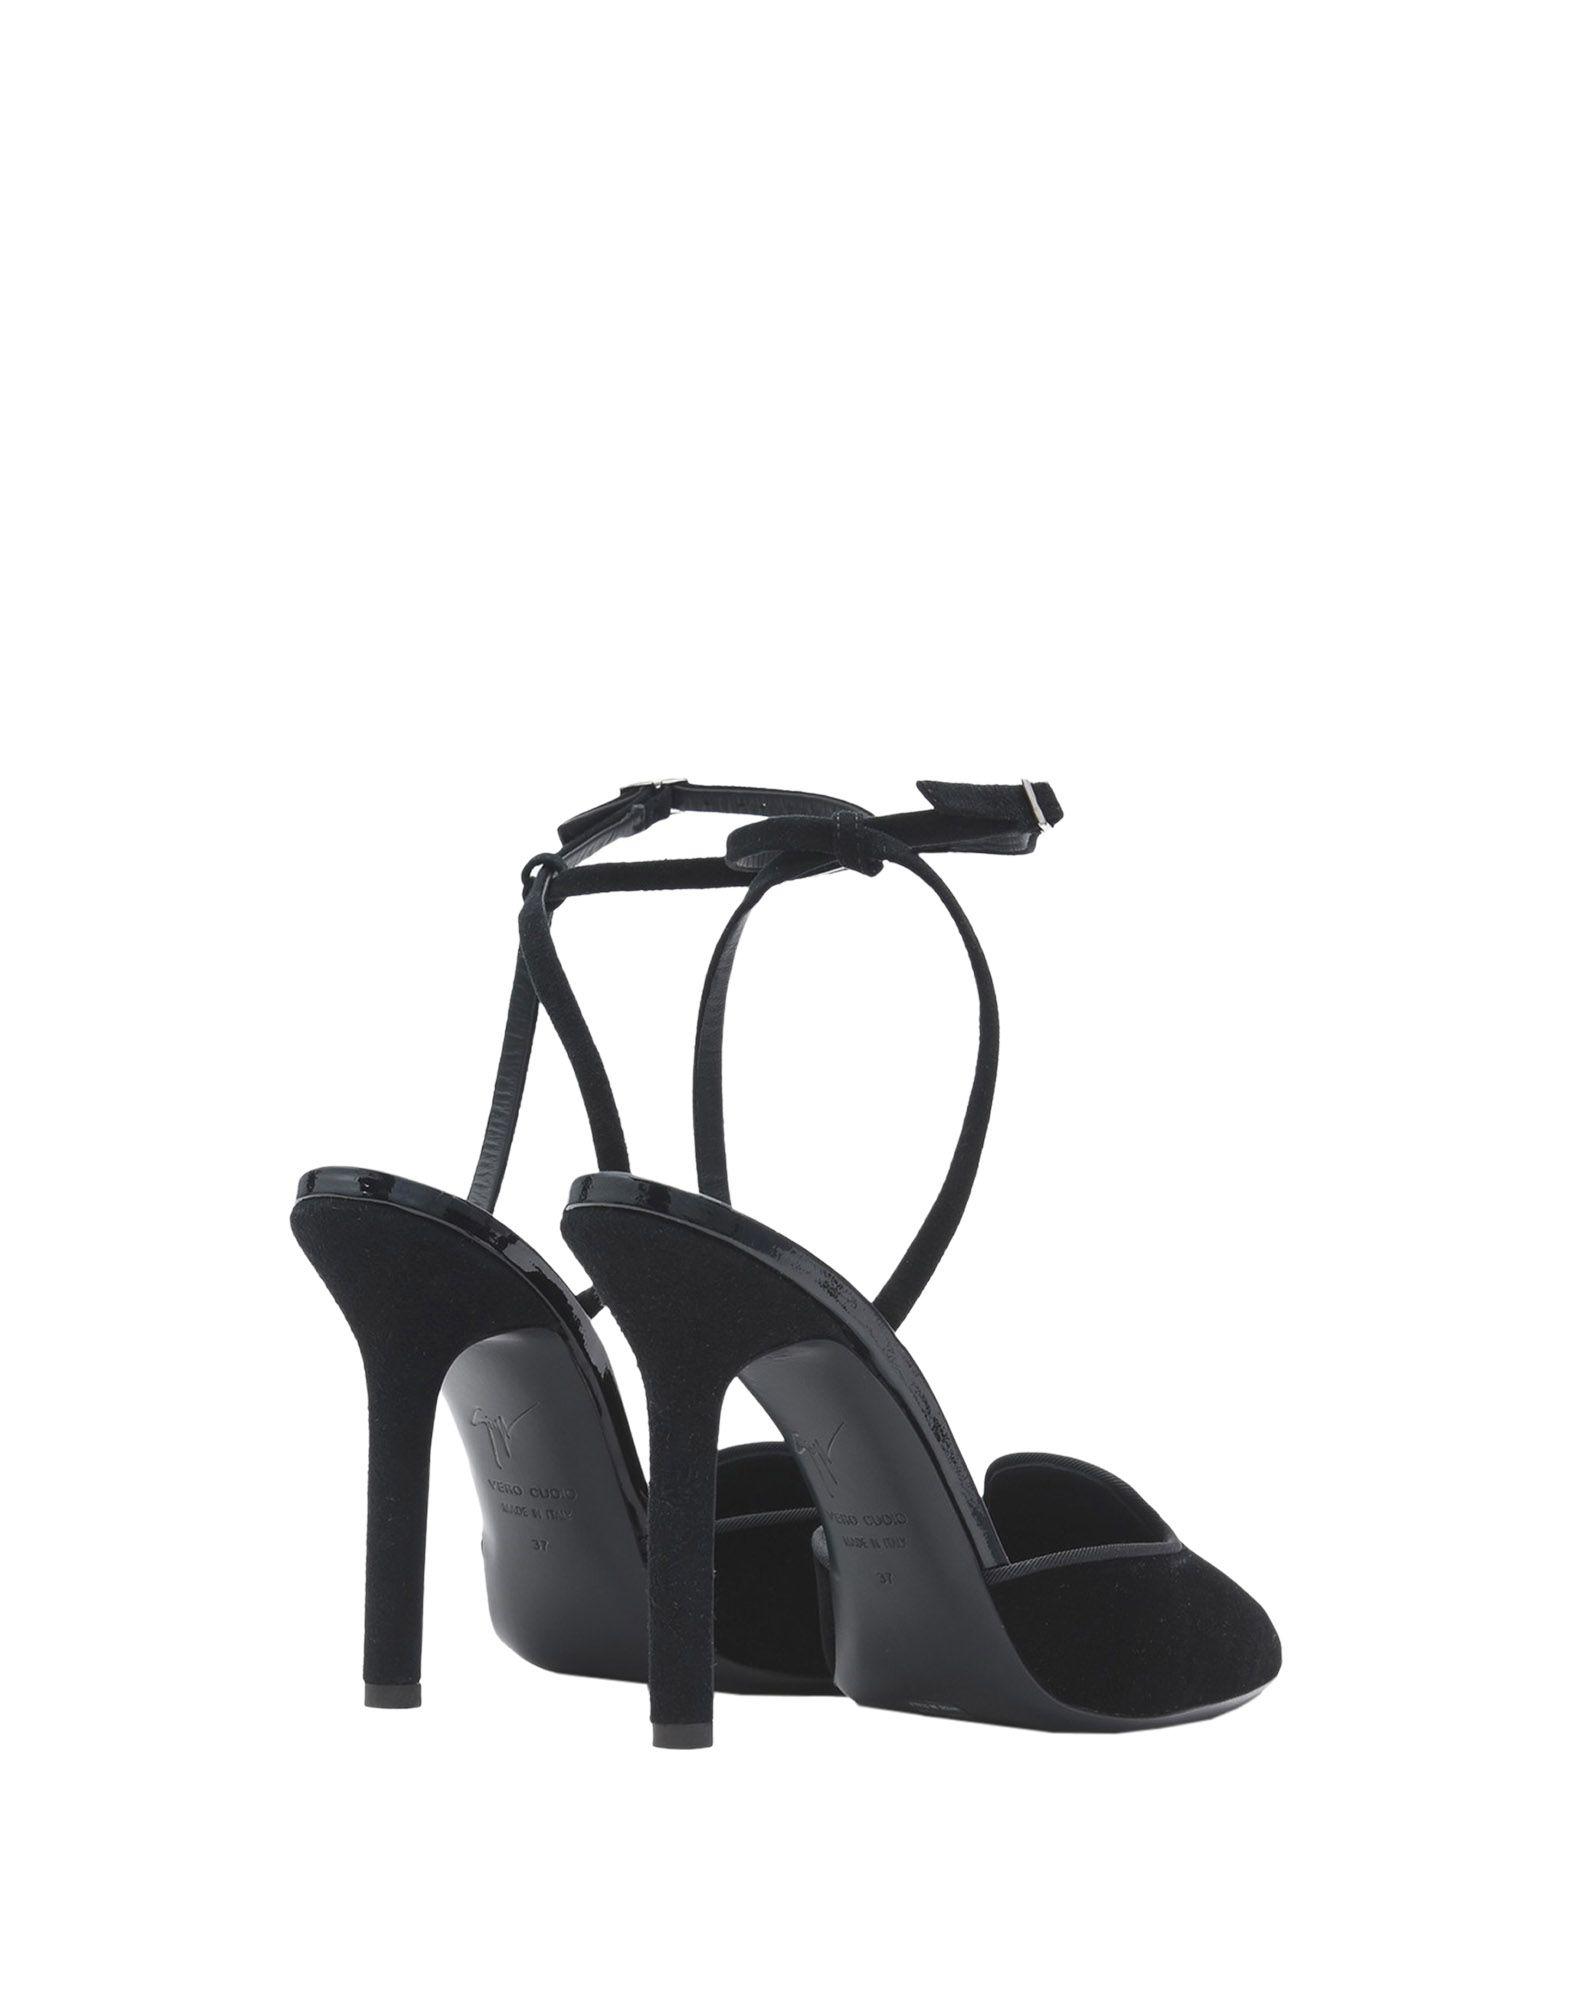 Giuseppe Zanotti Sandalen Damen  11481261VDGünstige gut aussehende Schuhe